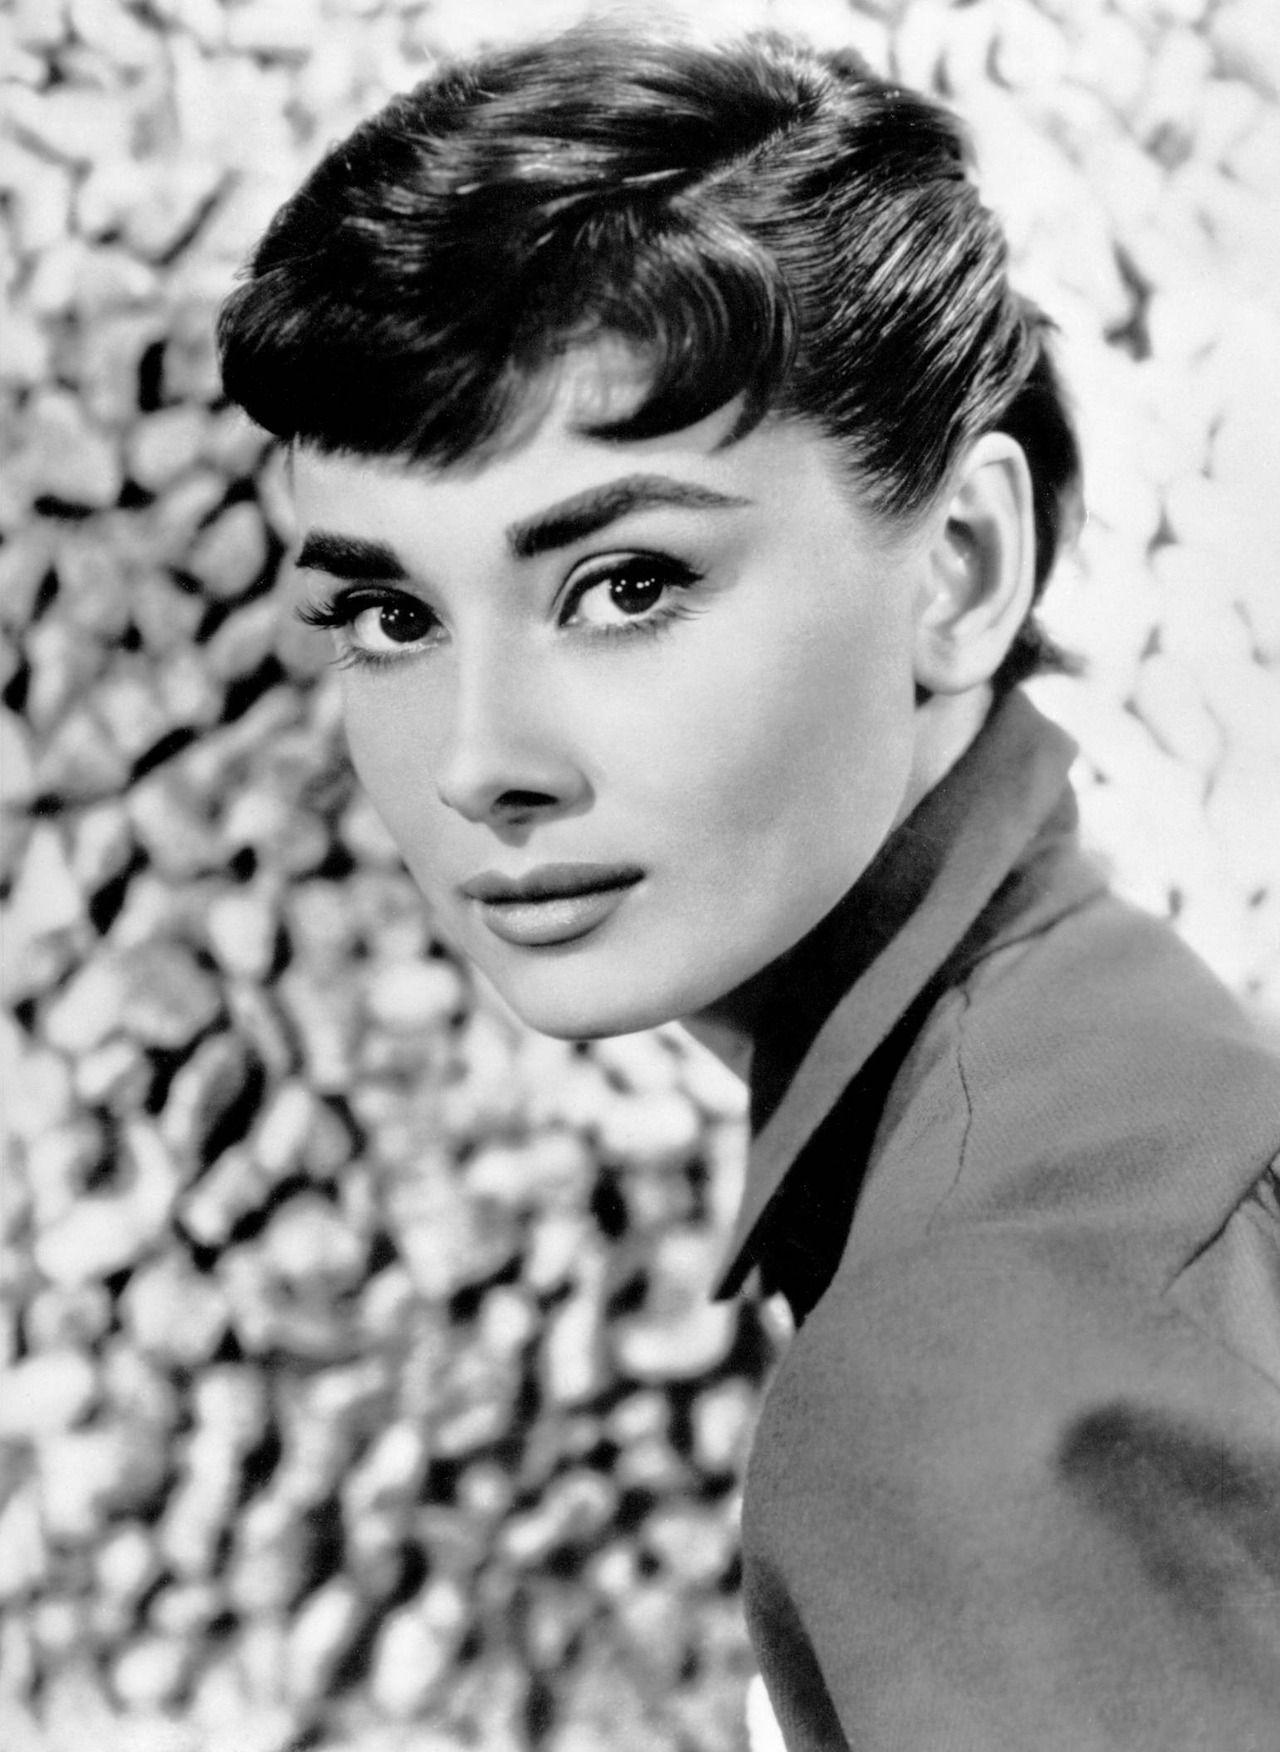 Audrey Hepburn Audrey Hepburn Bilder Frisur Audrey Hepburn Audrey Hepburn Mode